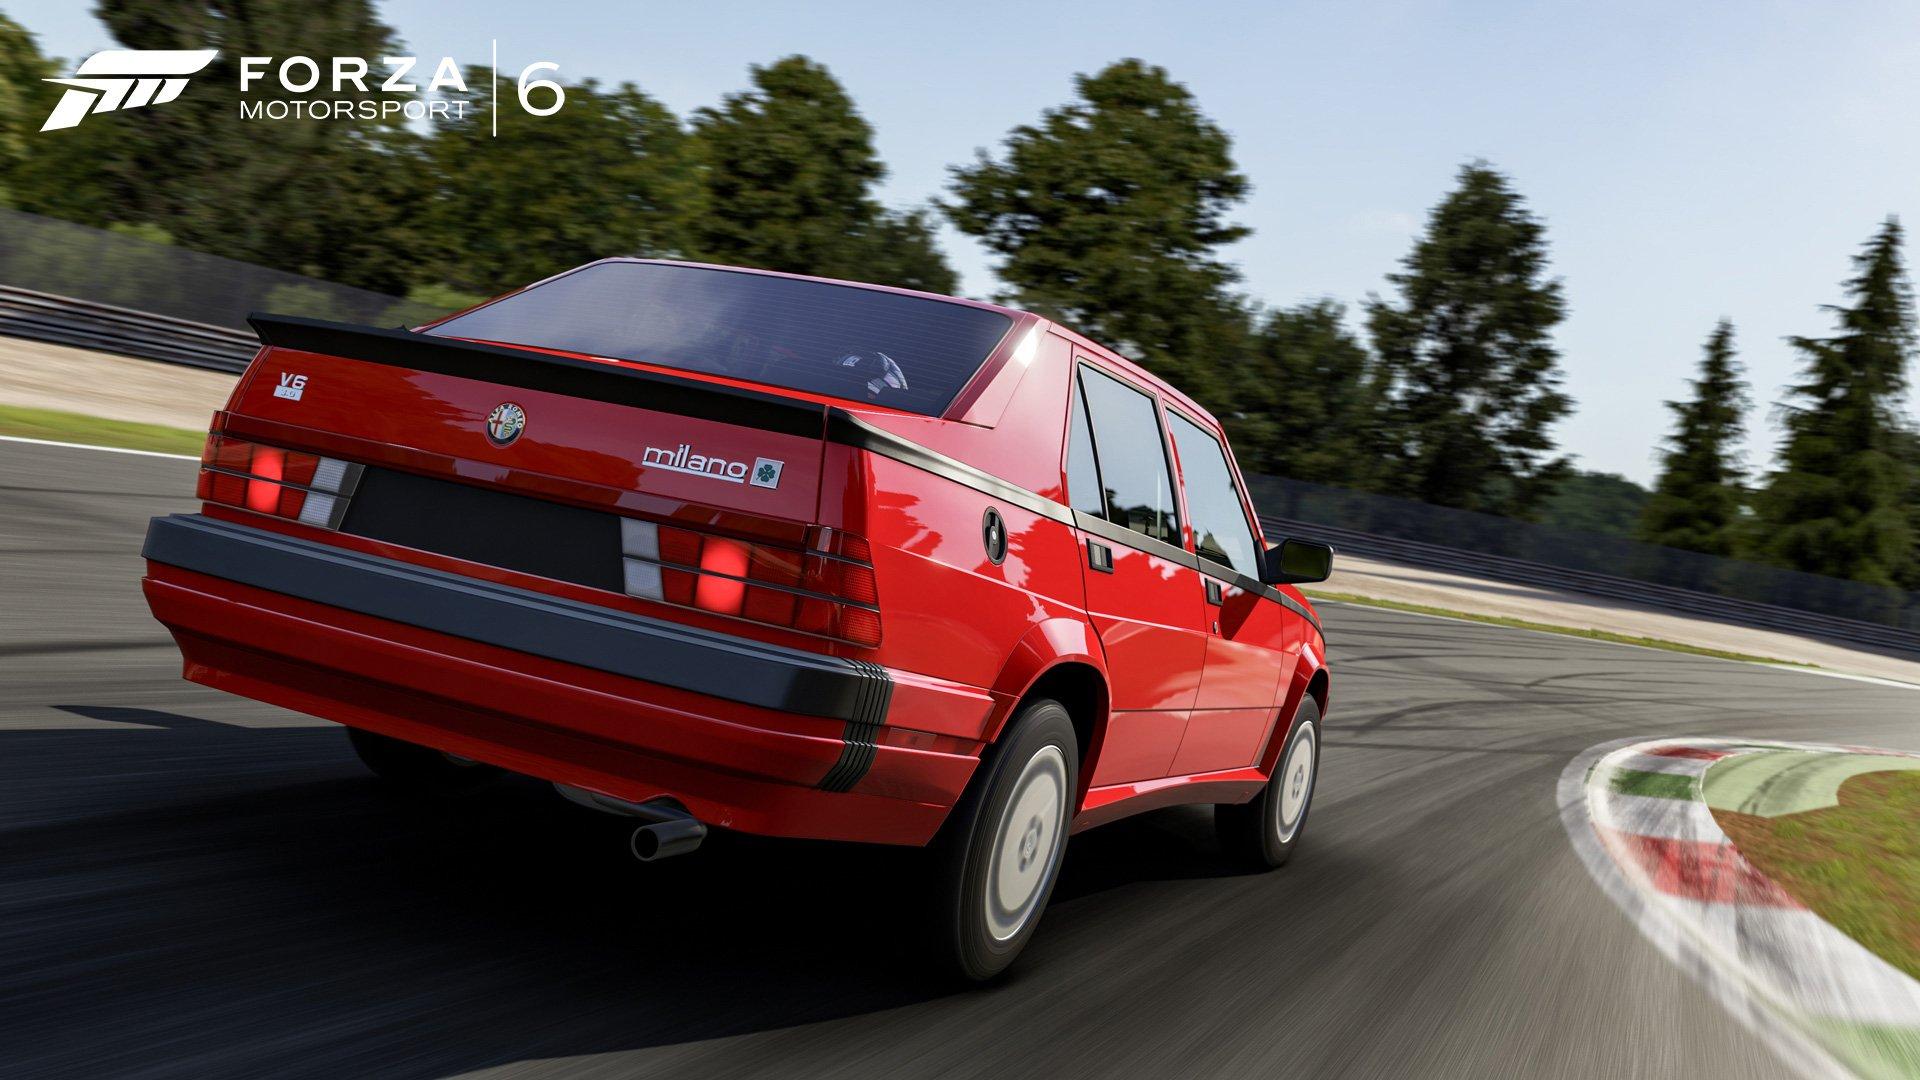 1992 Alfa Romeo Milano Quadrifoglio Verde Forza Motorsport 6